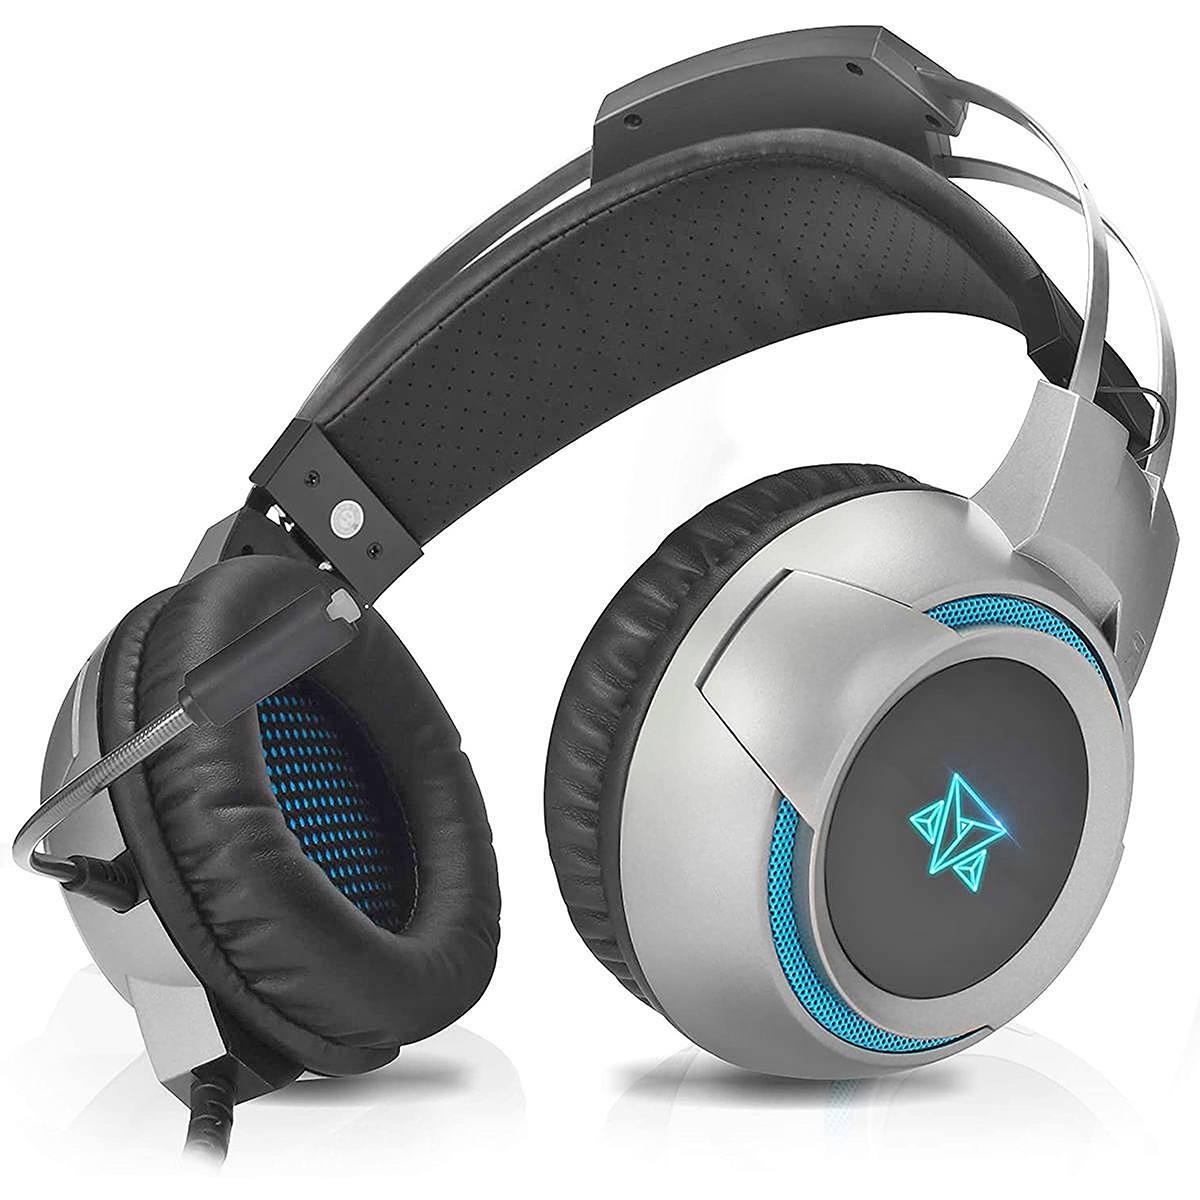 Headset Gamer Multi-Dispositivos Microfone Omnidirecional Drivers 50mm Adamantiun Fone Kira AH-1000